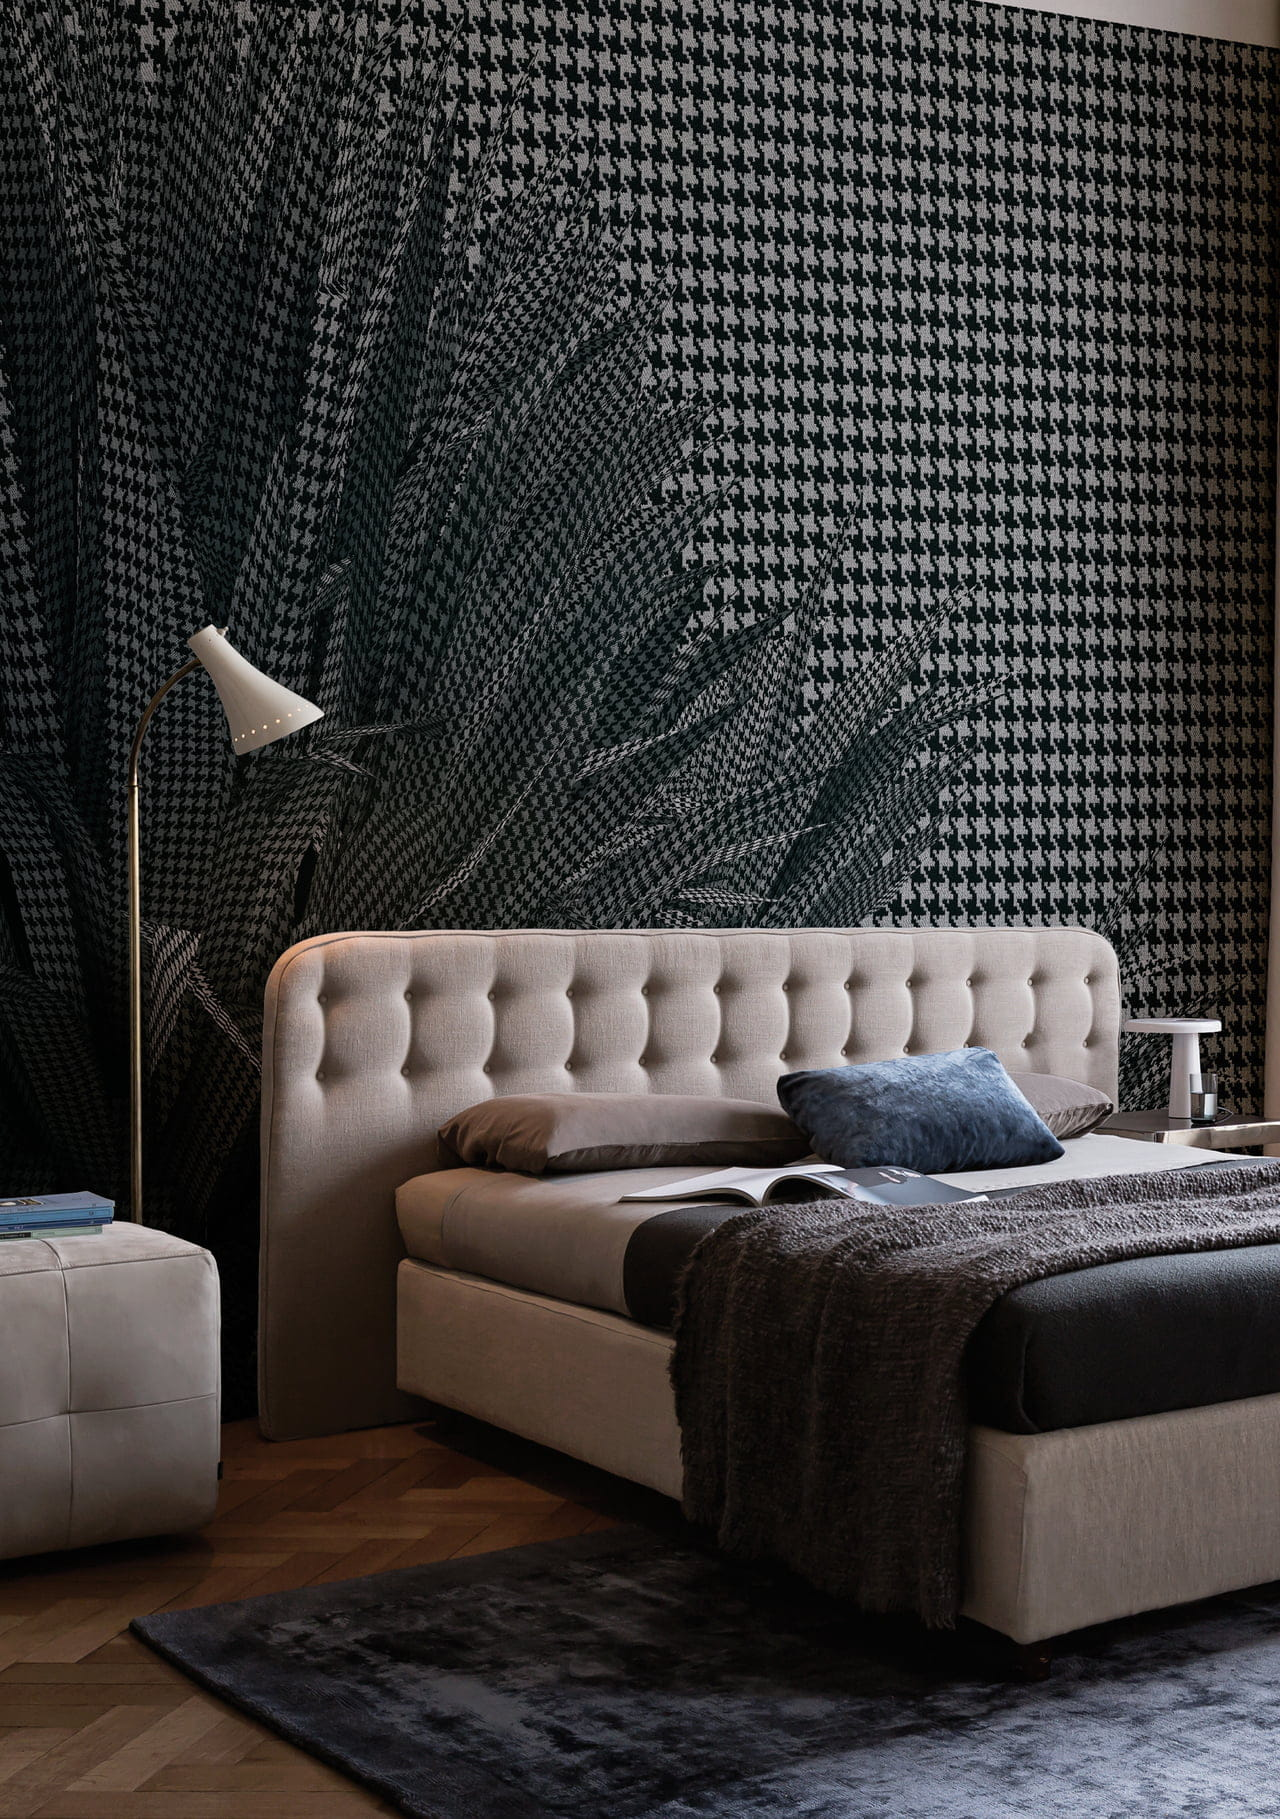 Carta da parati moderna design sui muri for Carta da parati moderna per soggiorno